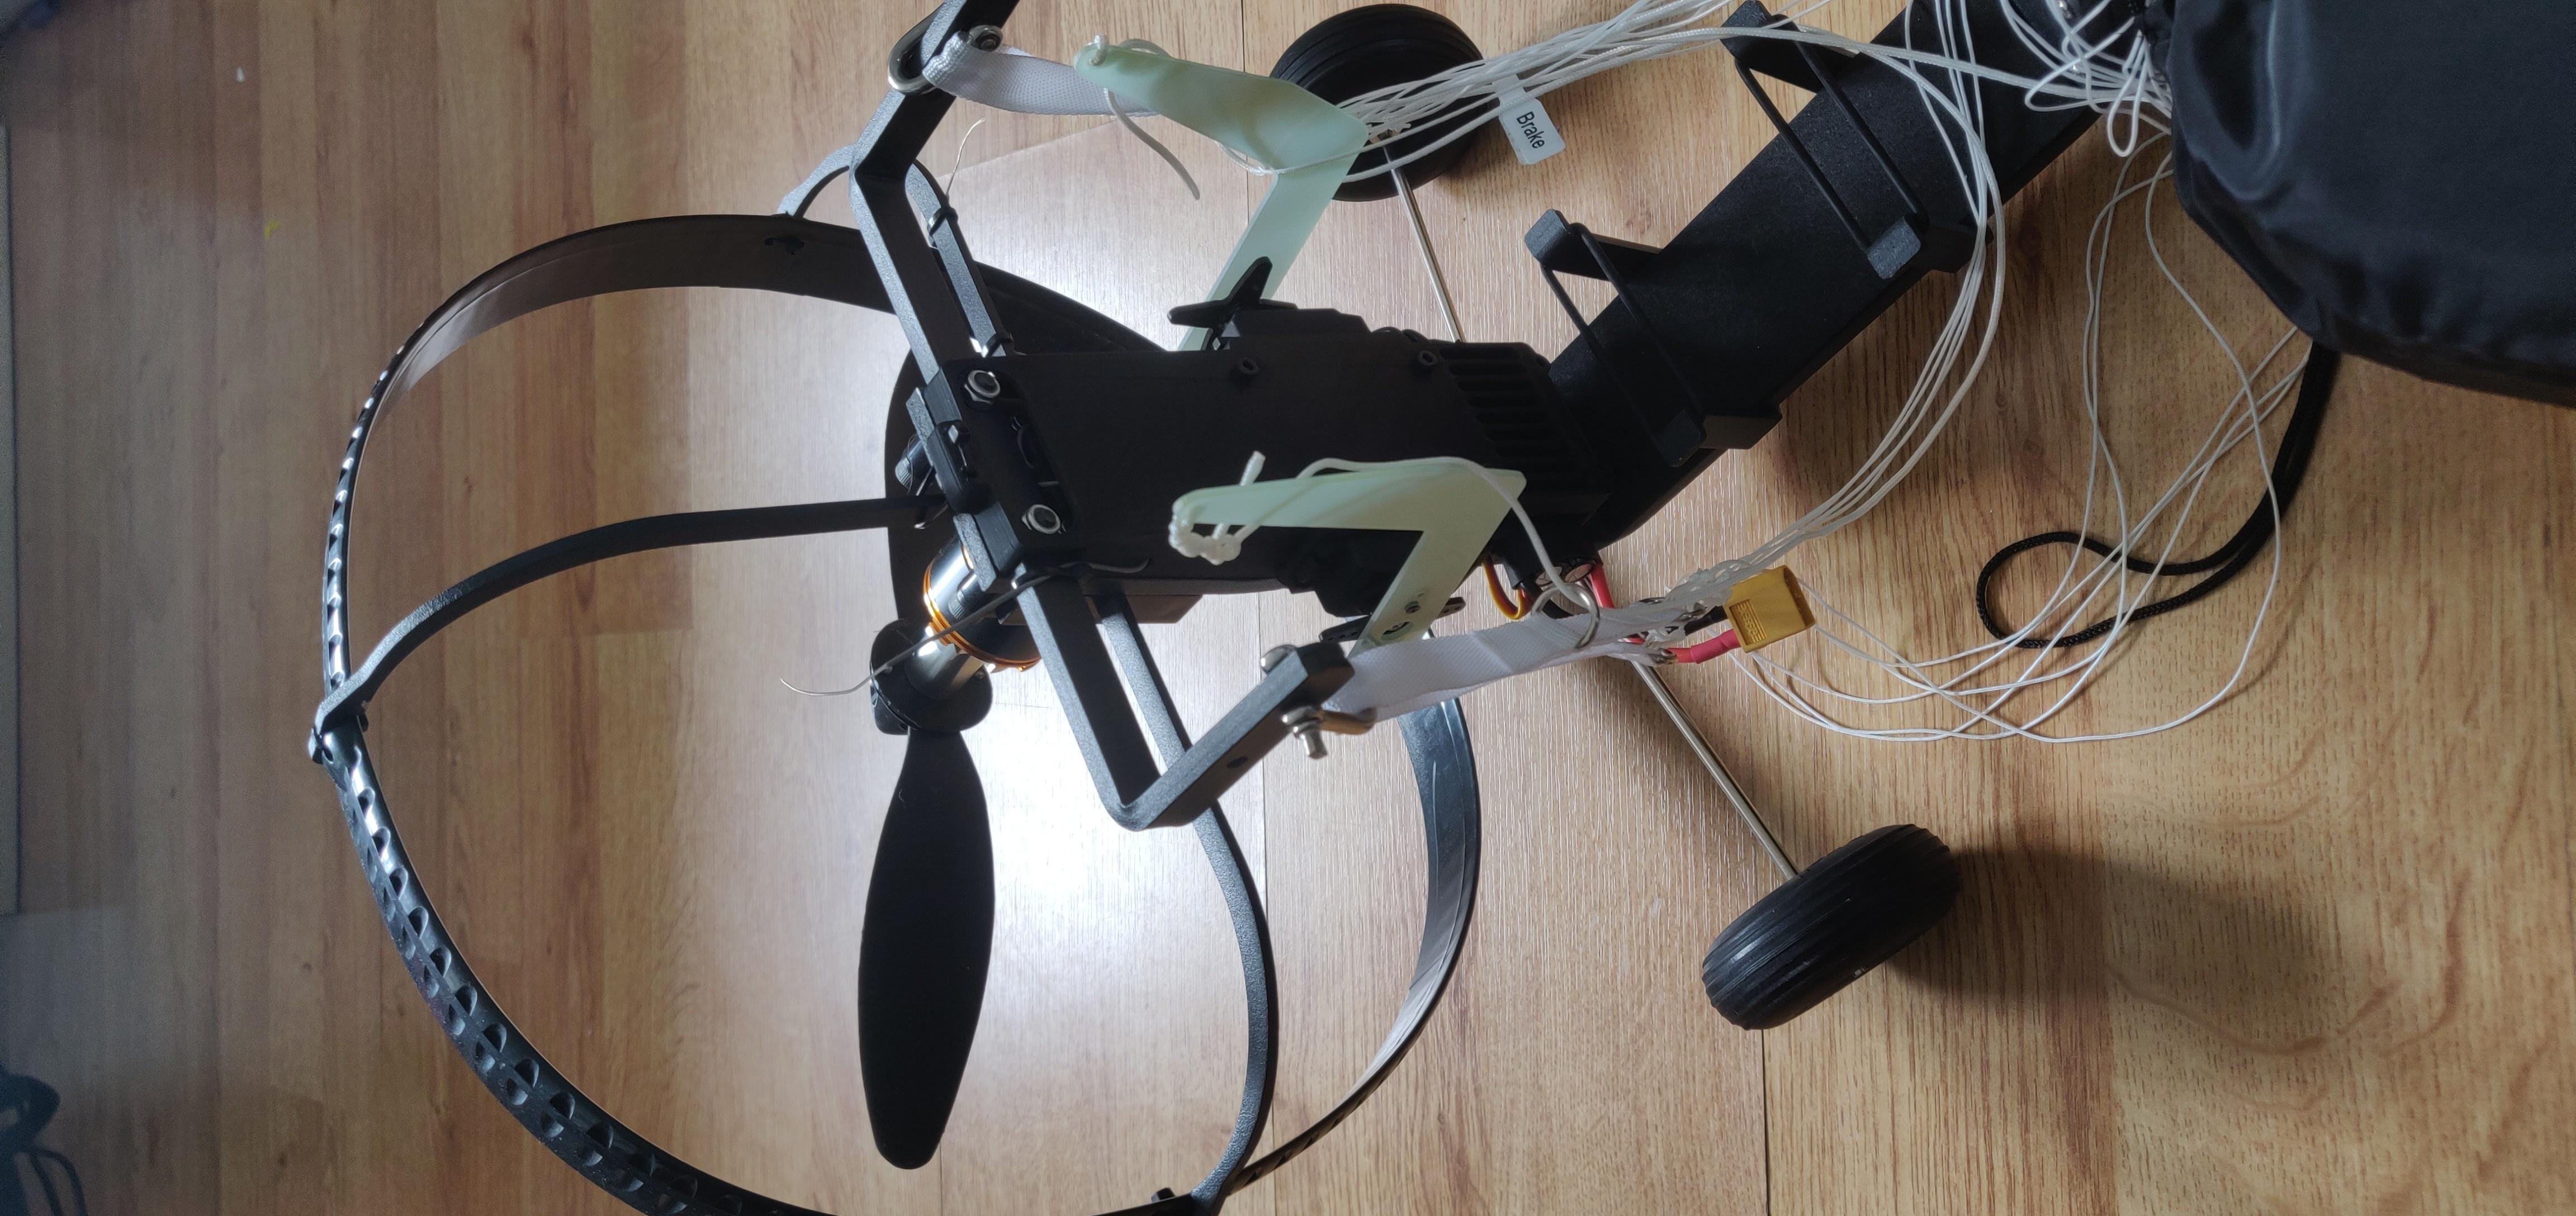 IMG_20190903_143101.jpg Download STL file Paraglider Hobby King • 3D printer object, Aeronmax